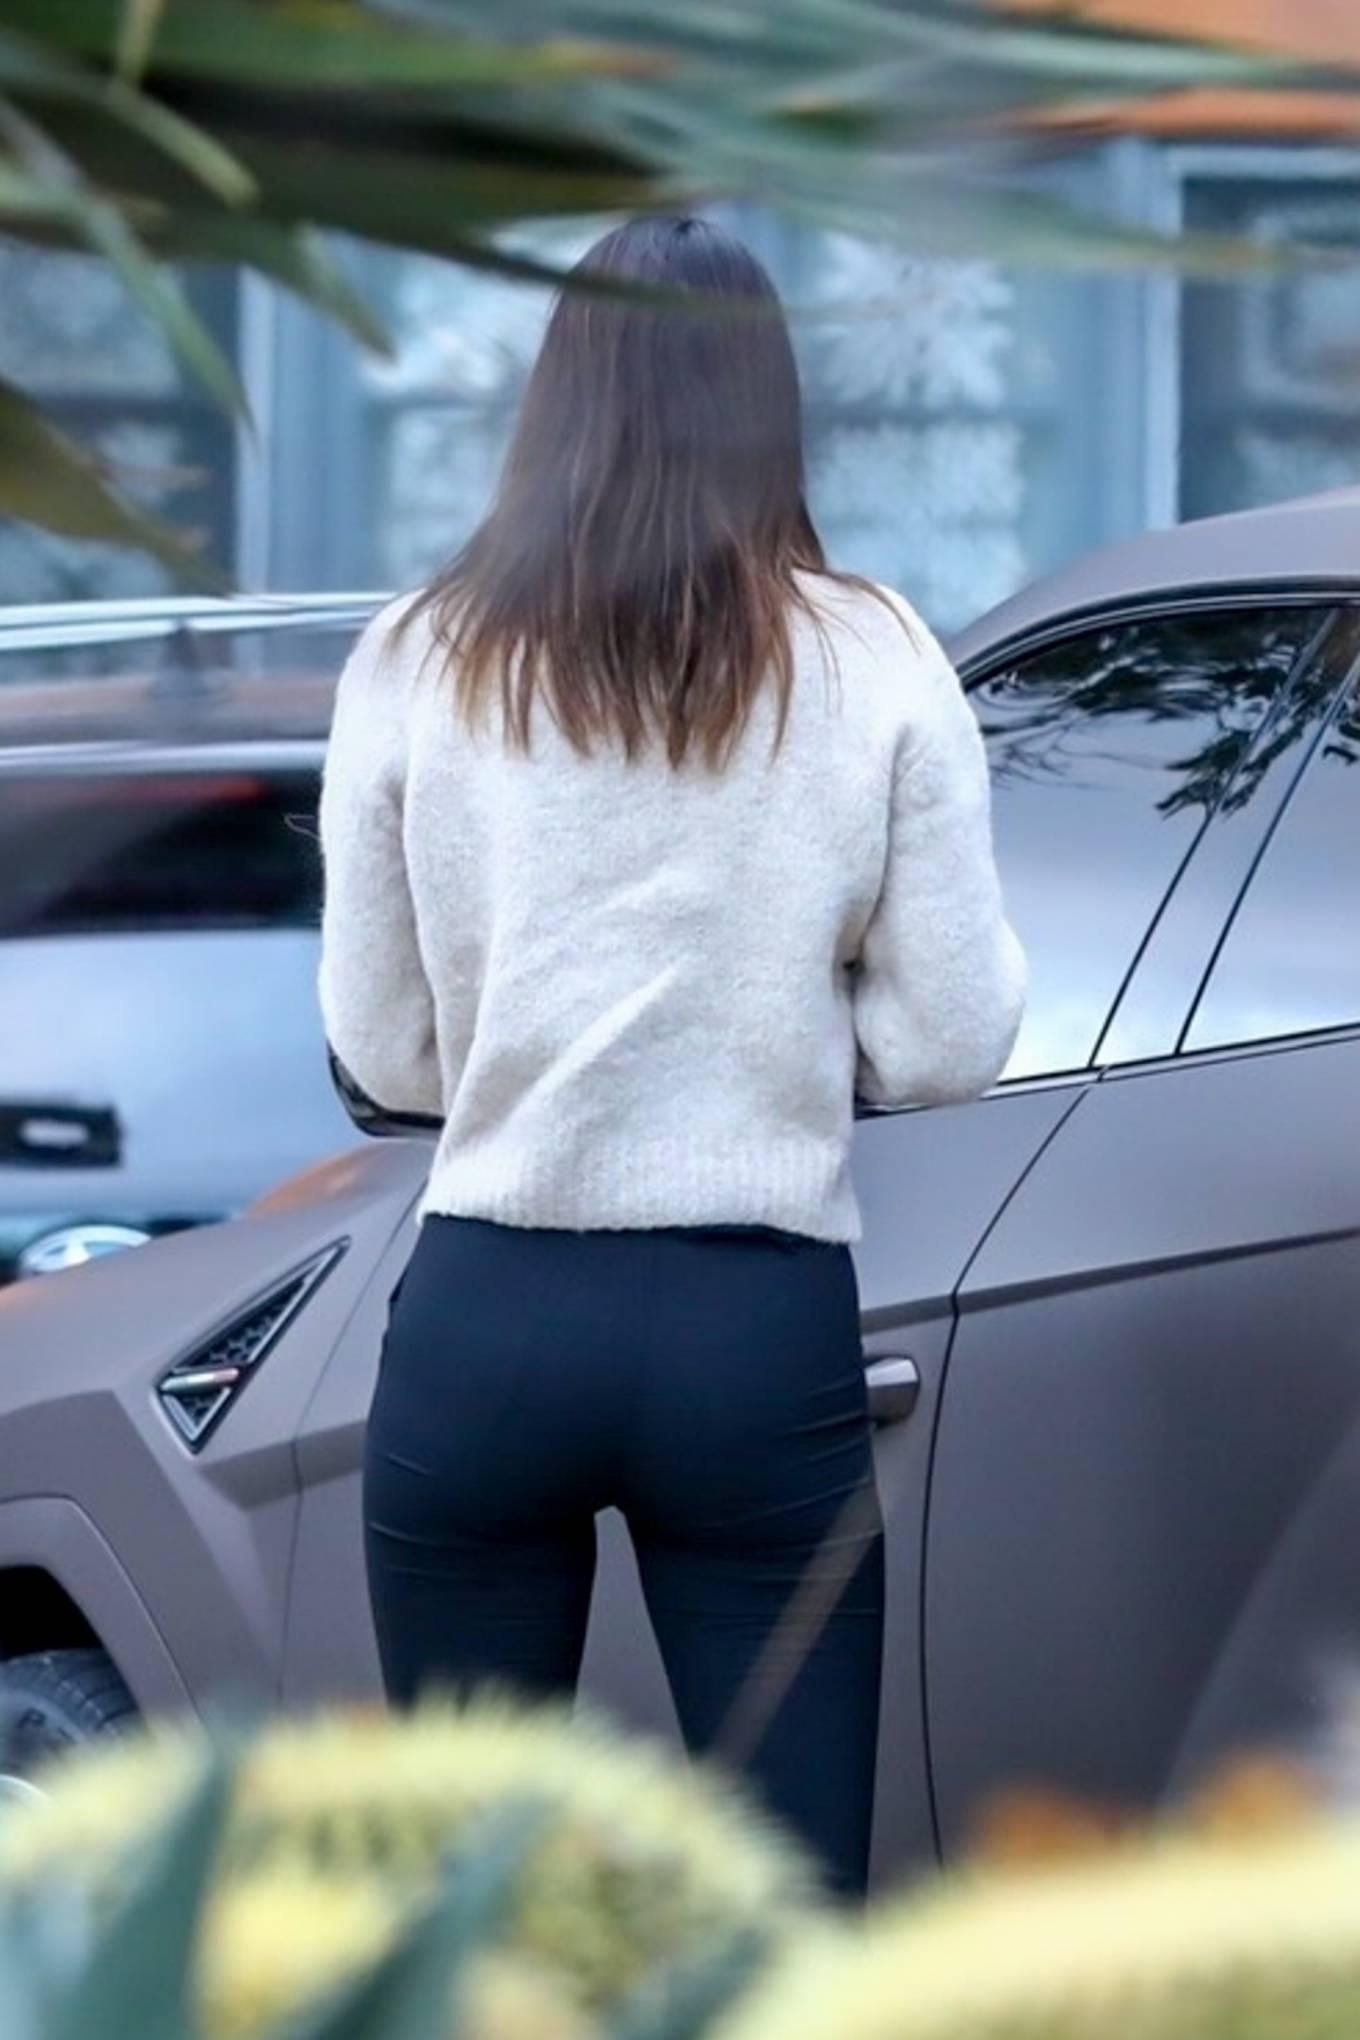 Kendall Jenner wearing black leggings with side pockets